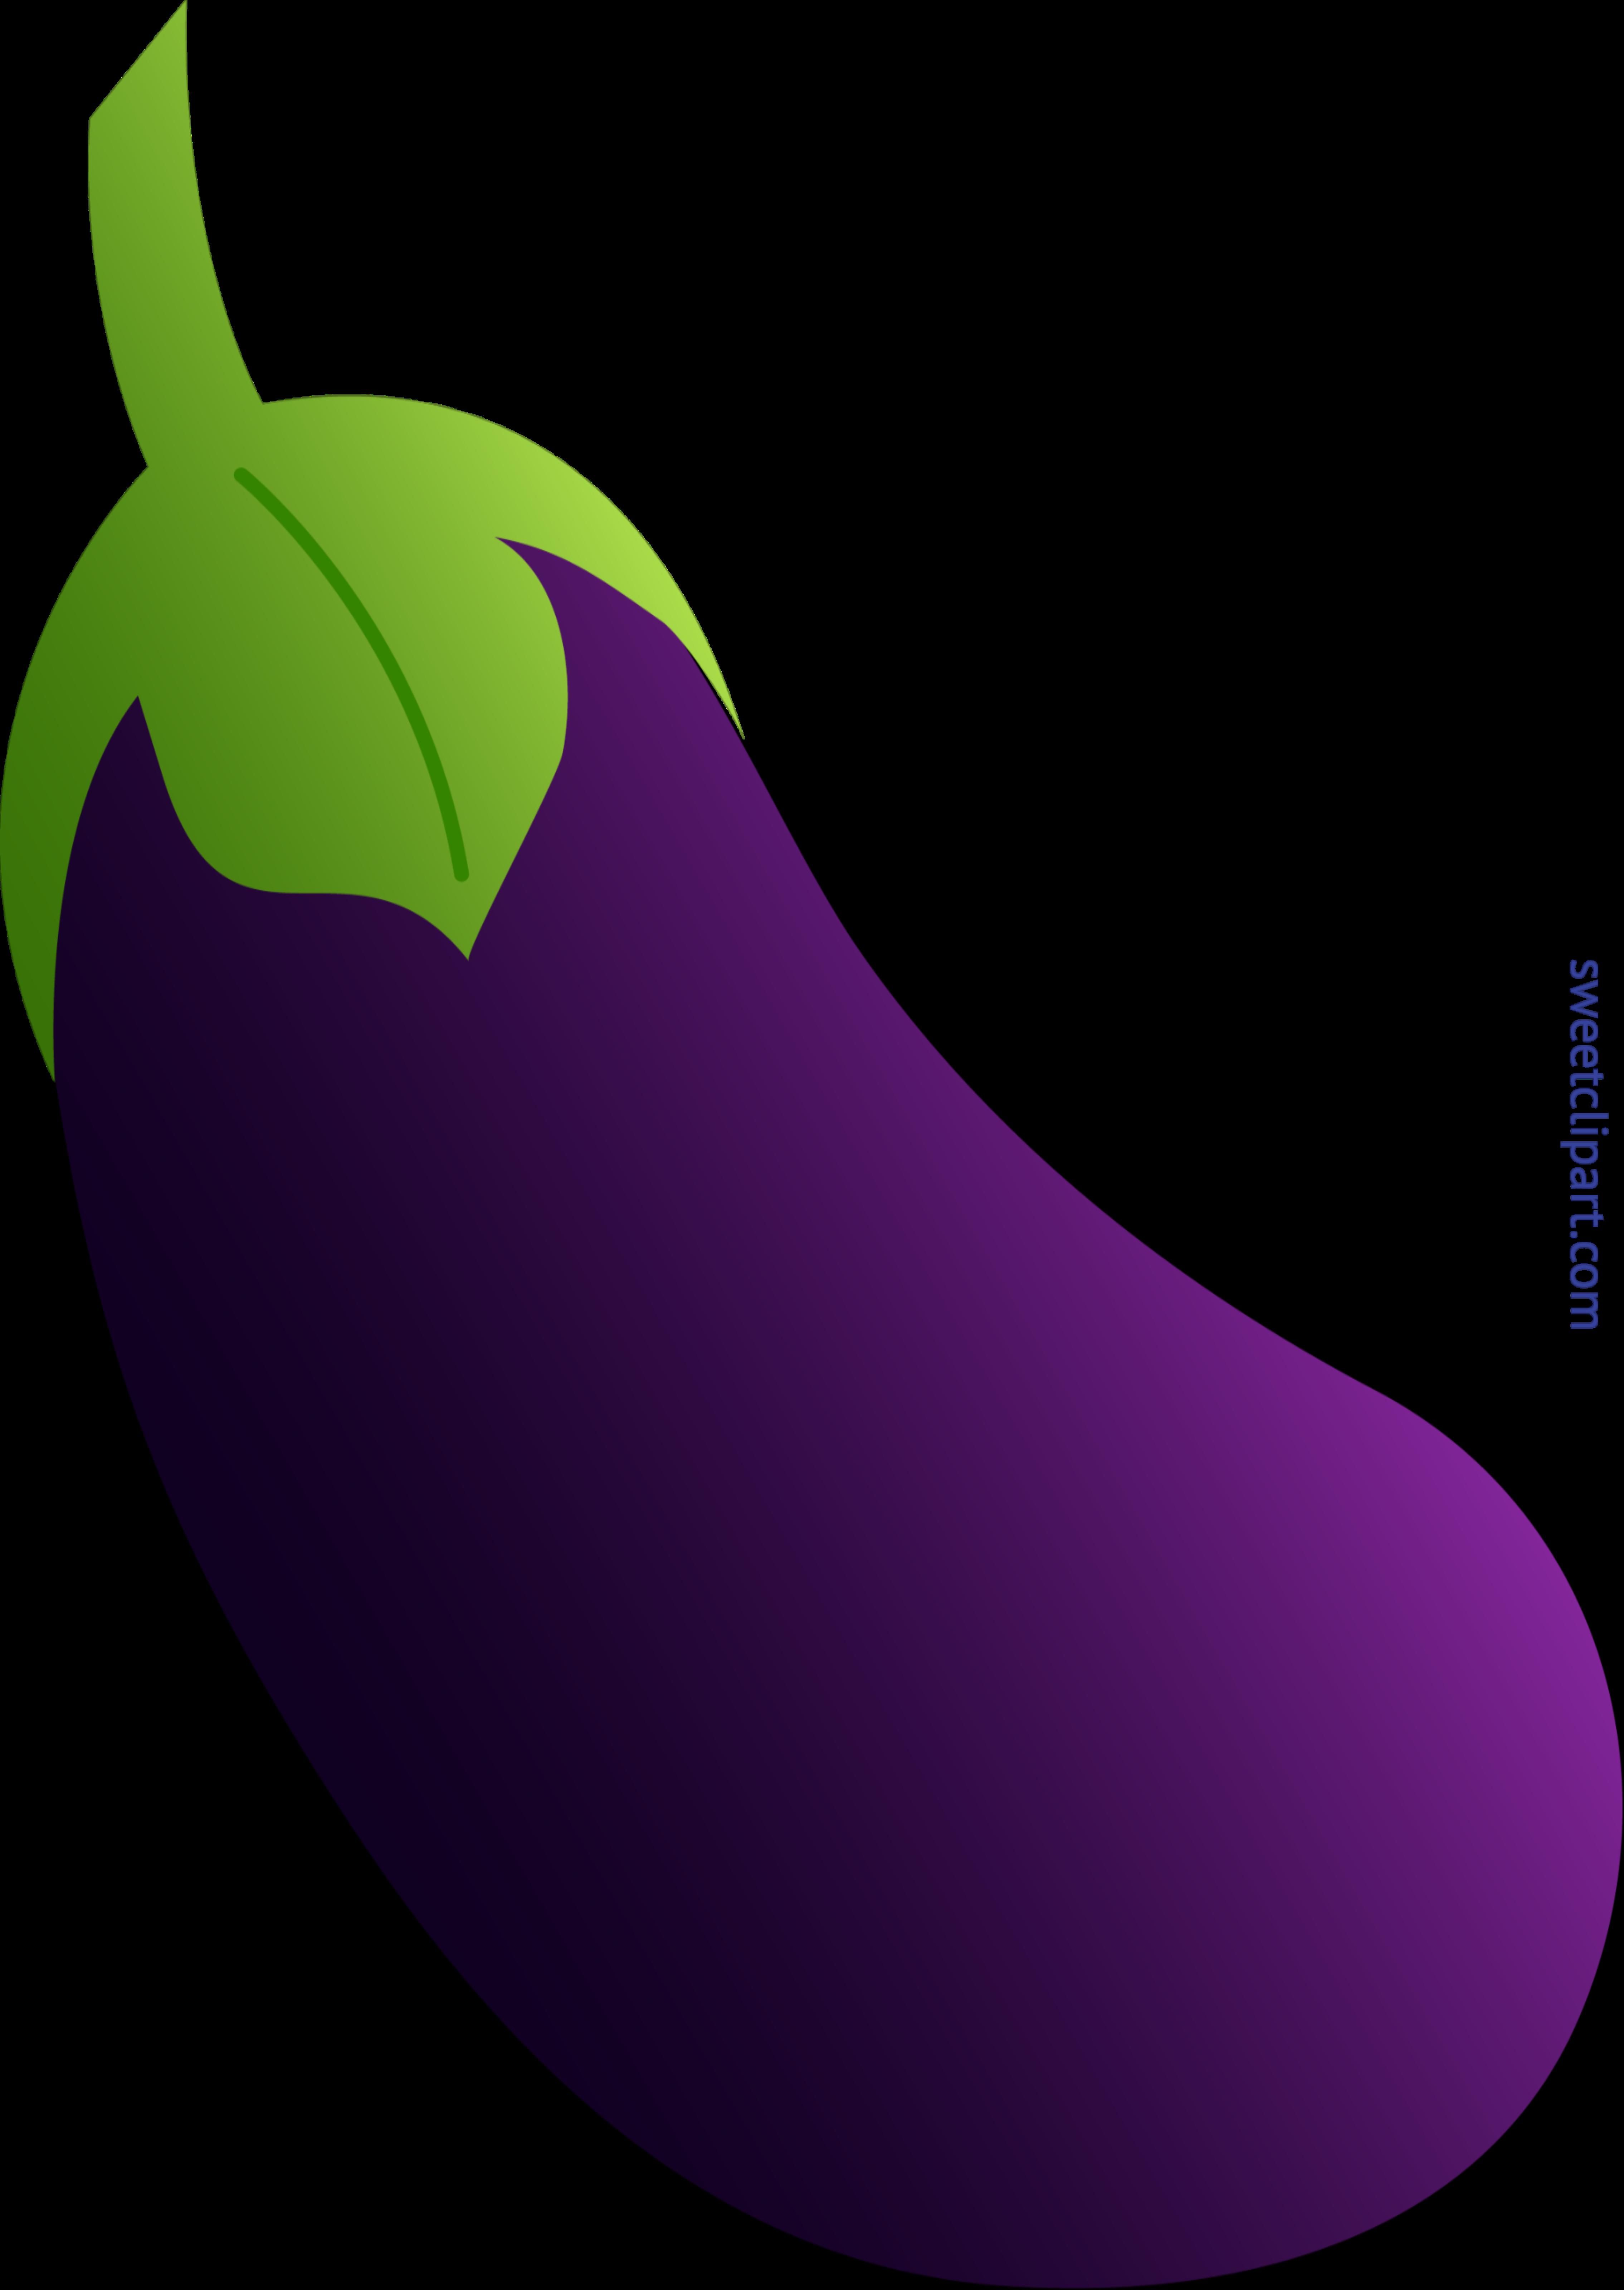 svg free stock Clip art sweet. Eggplant clipart.